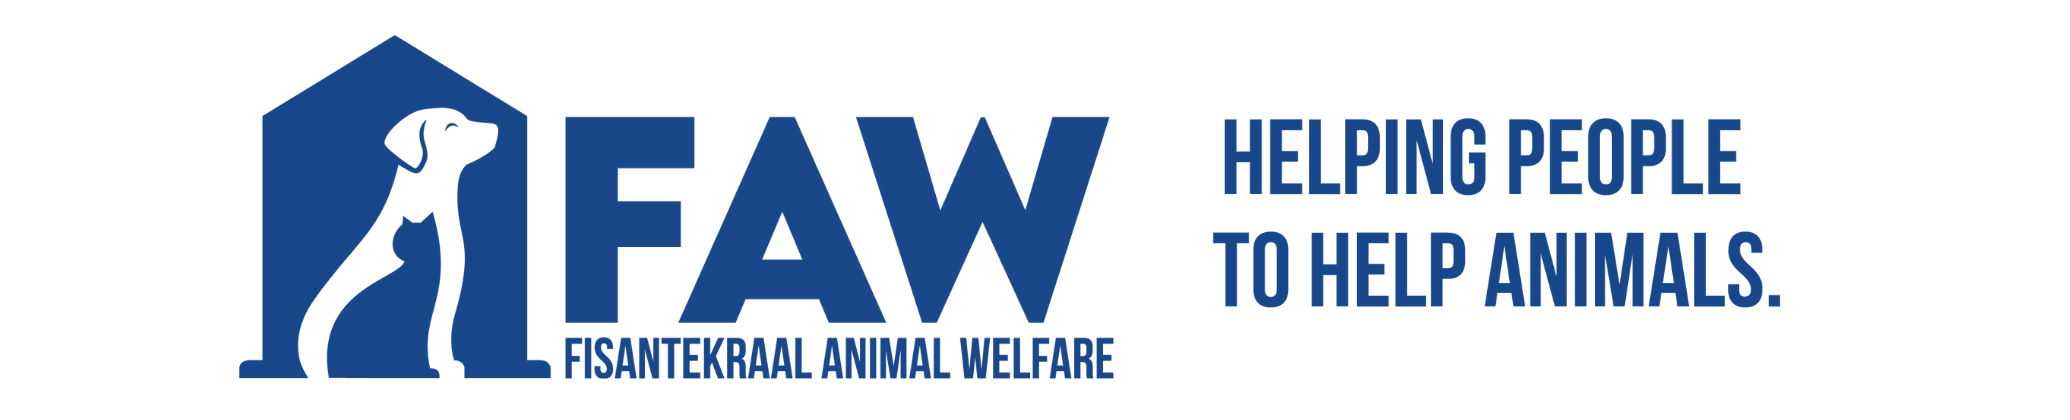 Fisantekraal Animal Welfare